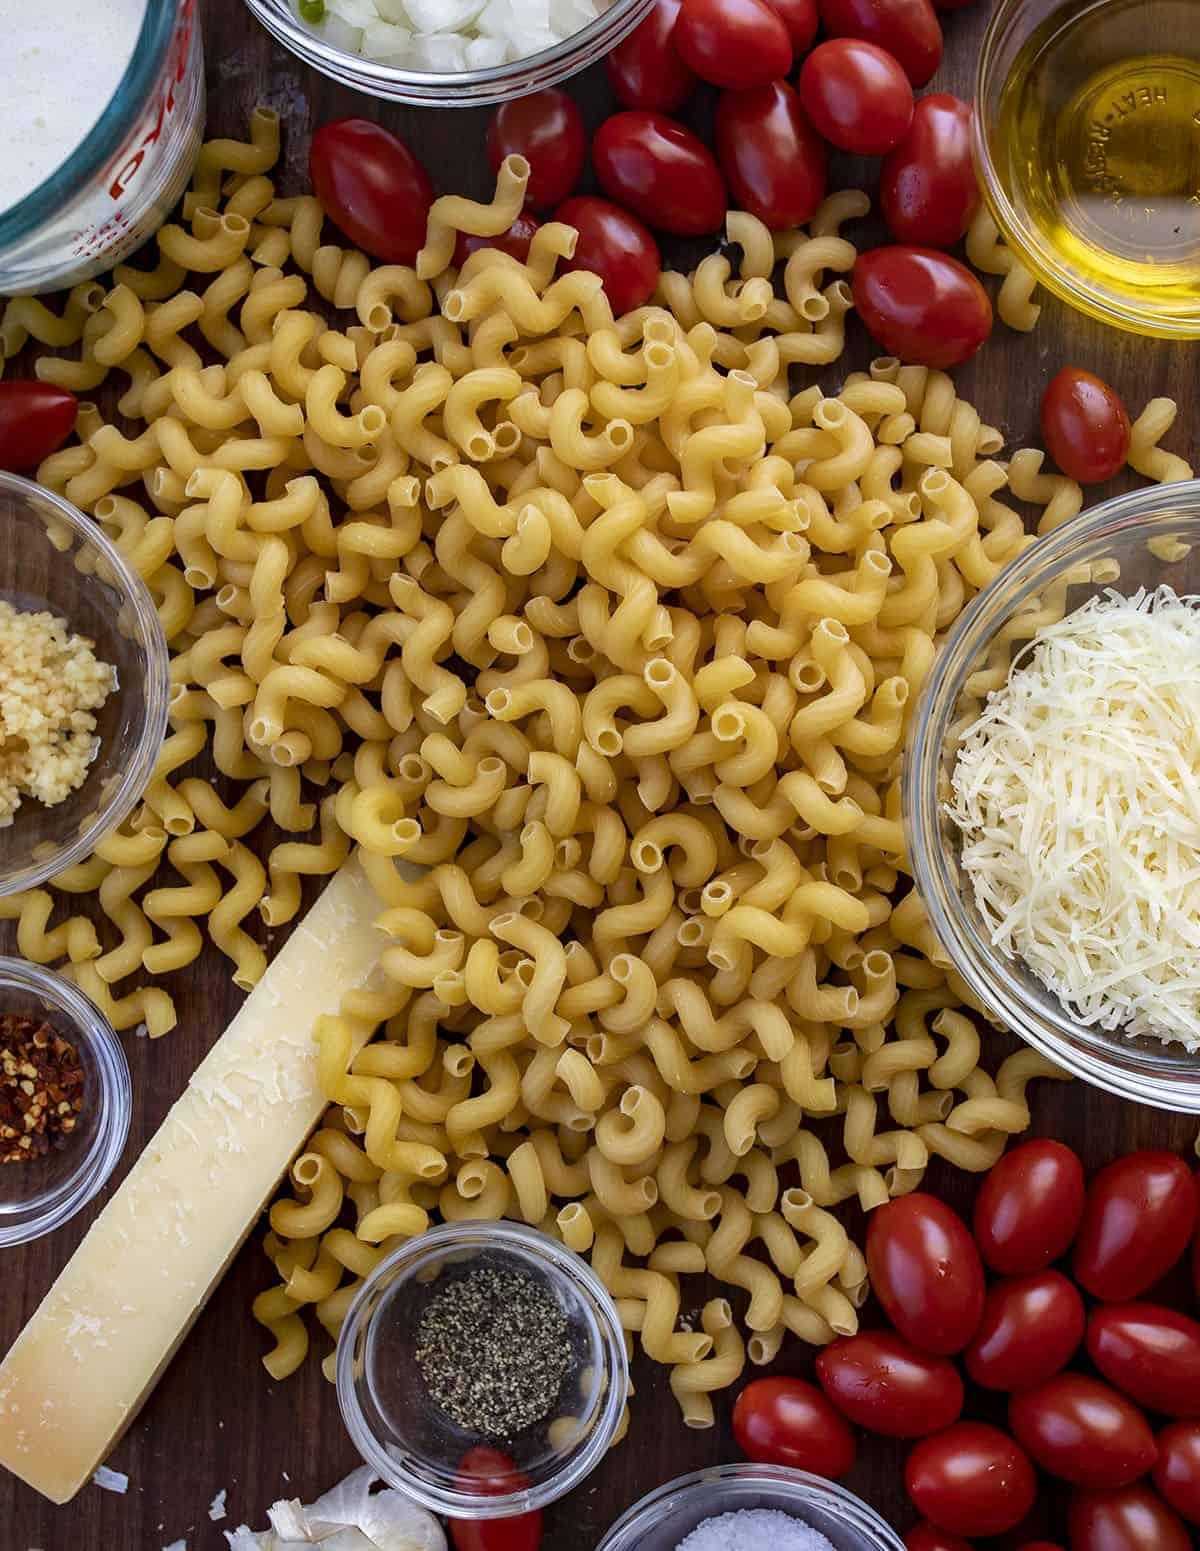 Raw Ingredients for Creamy Tomato Pasta Recipe